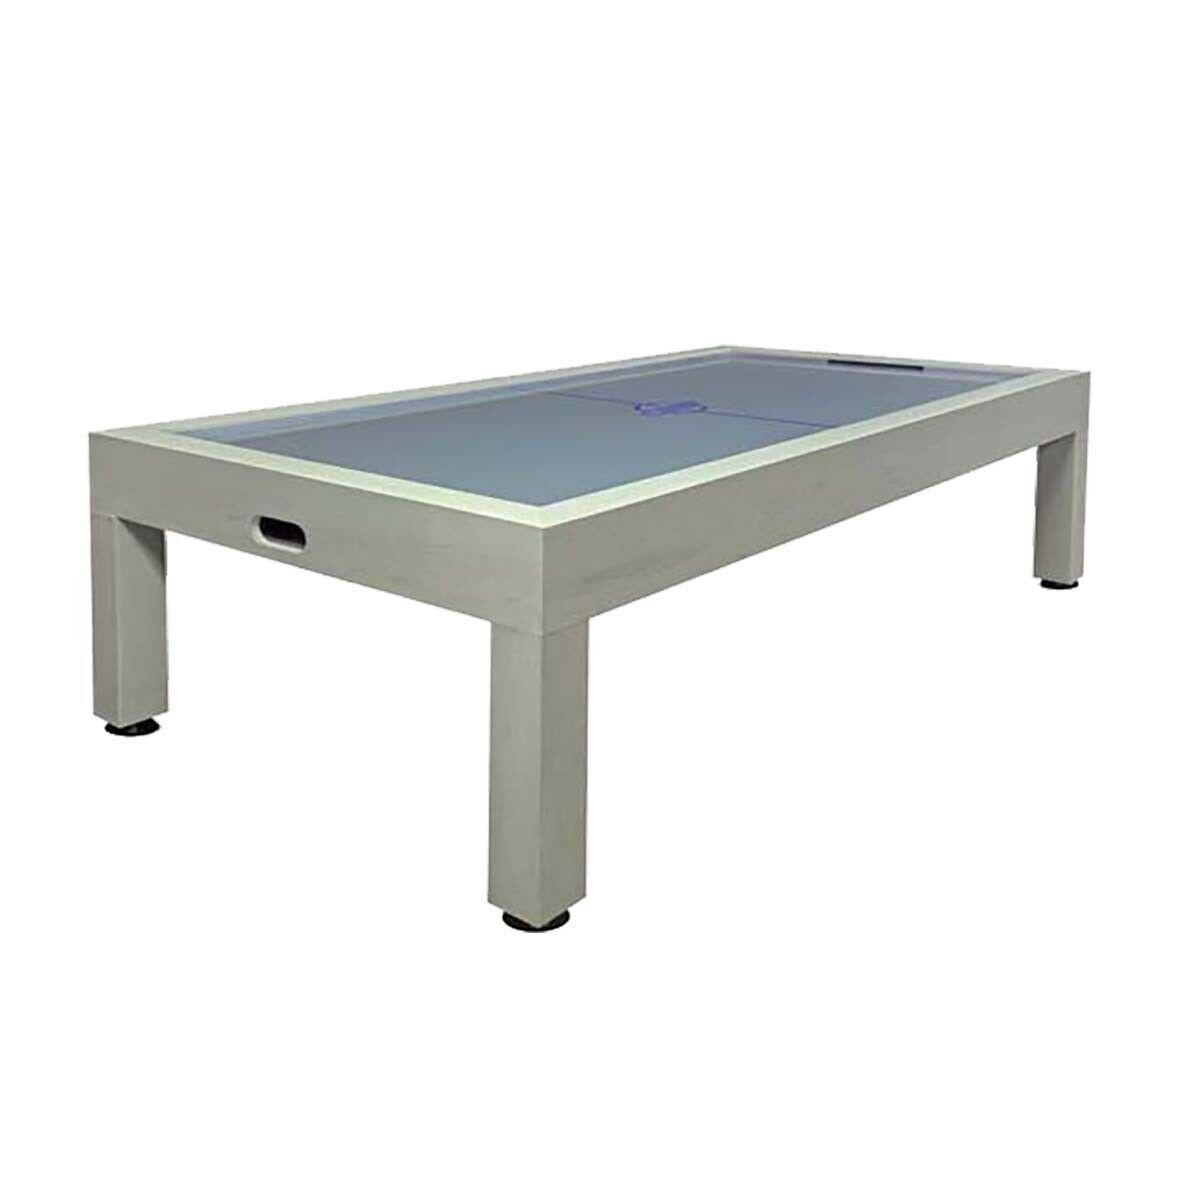 Dynamo Astoria Air Hockey Table Driftwood Maple In 2020 Air Hockey Table Air Hockey Home